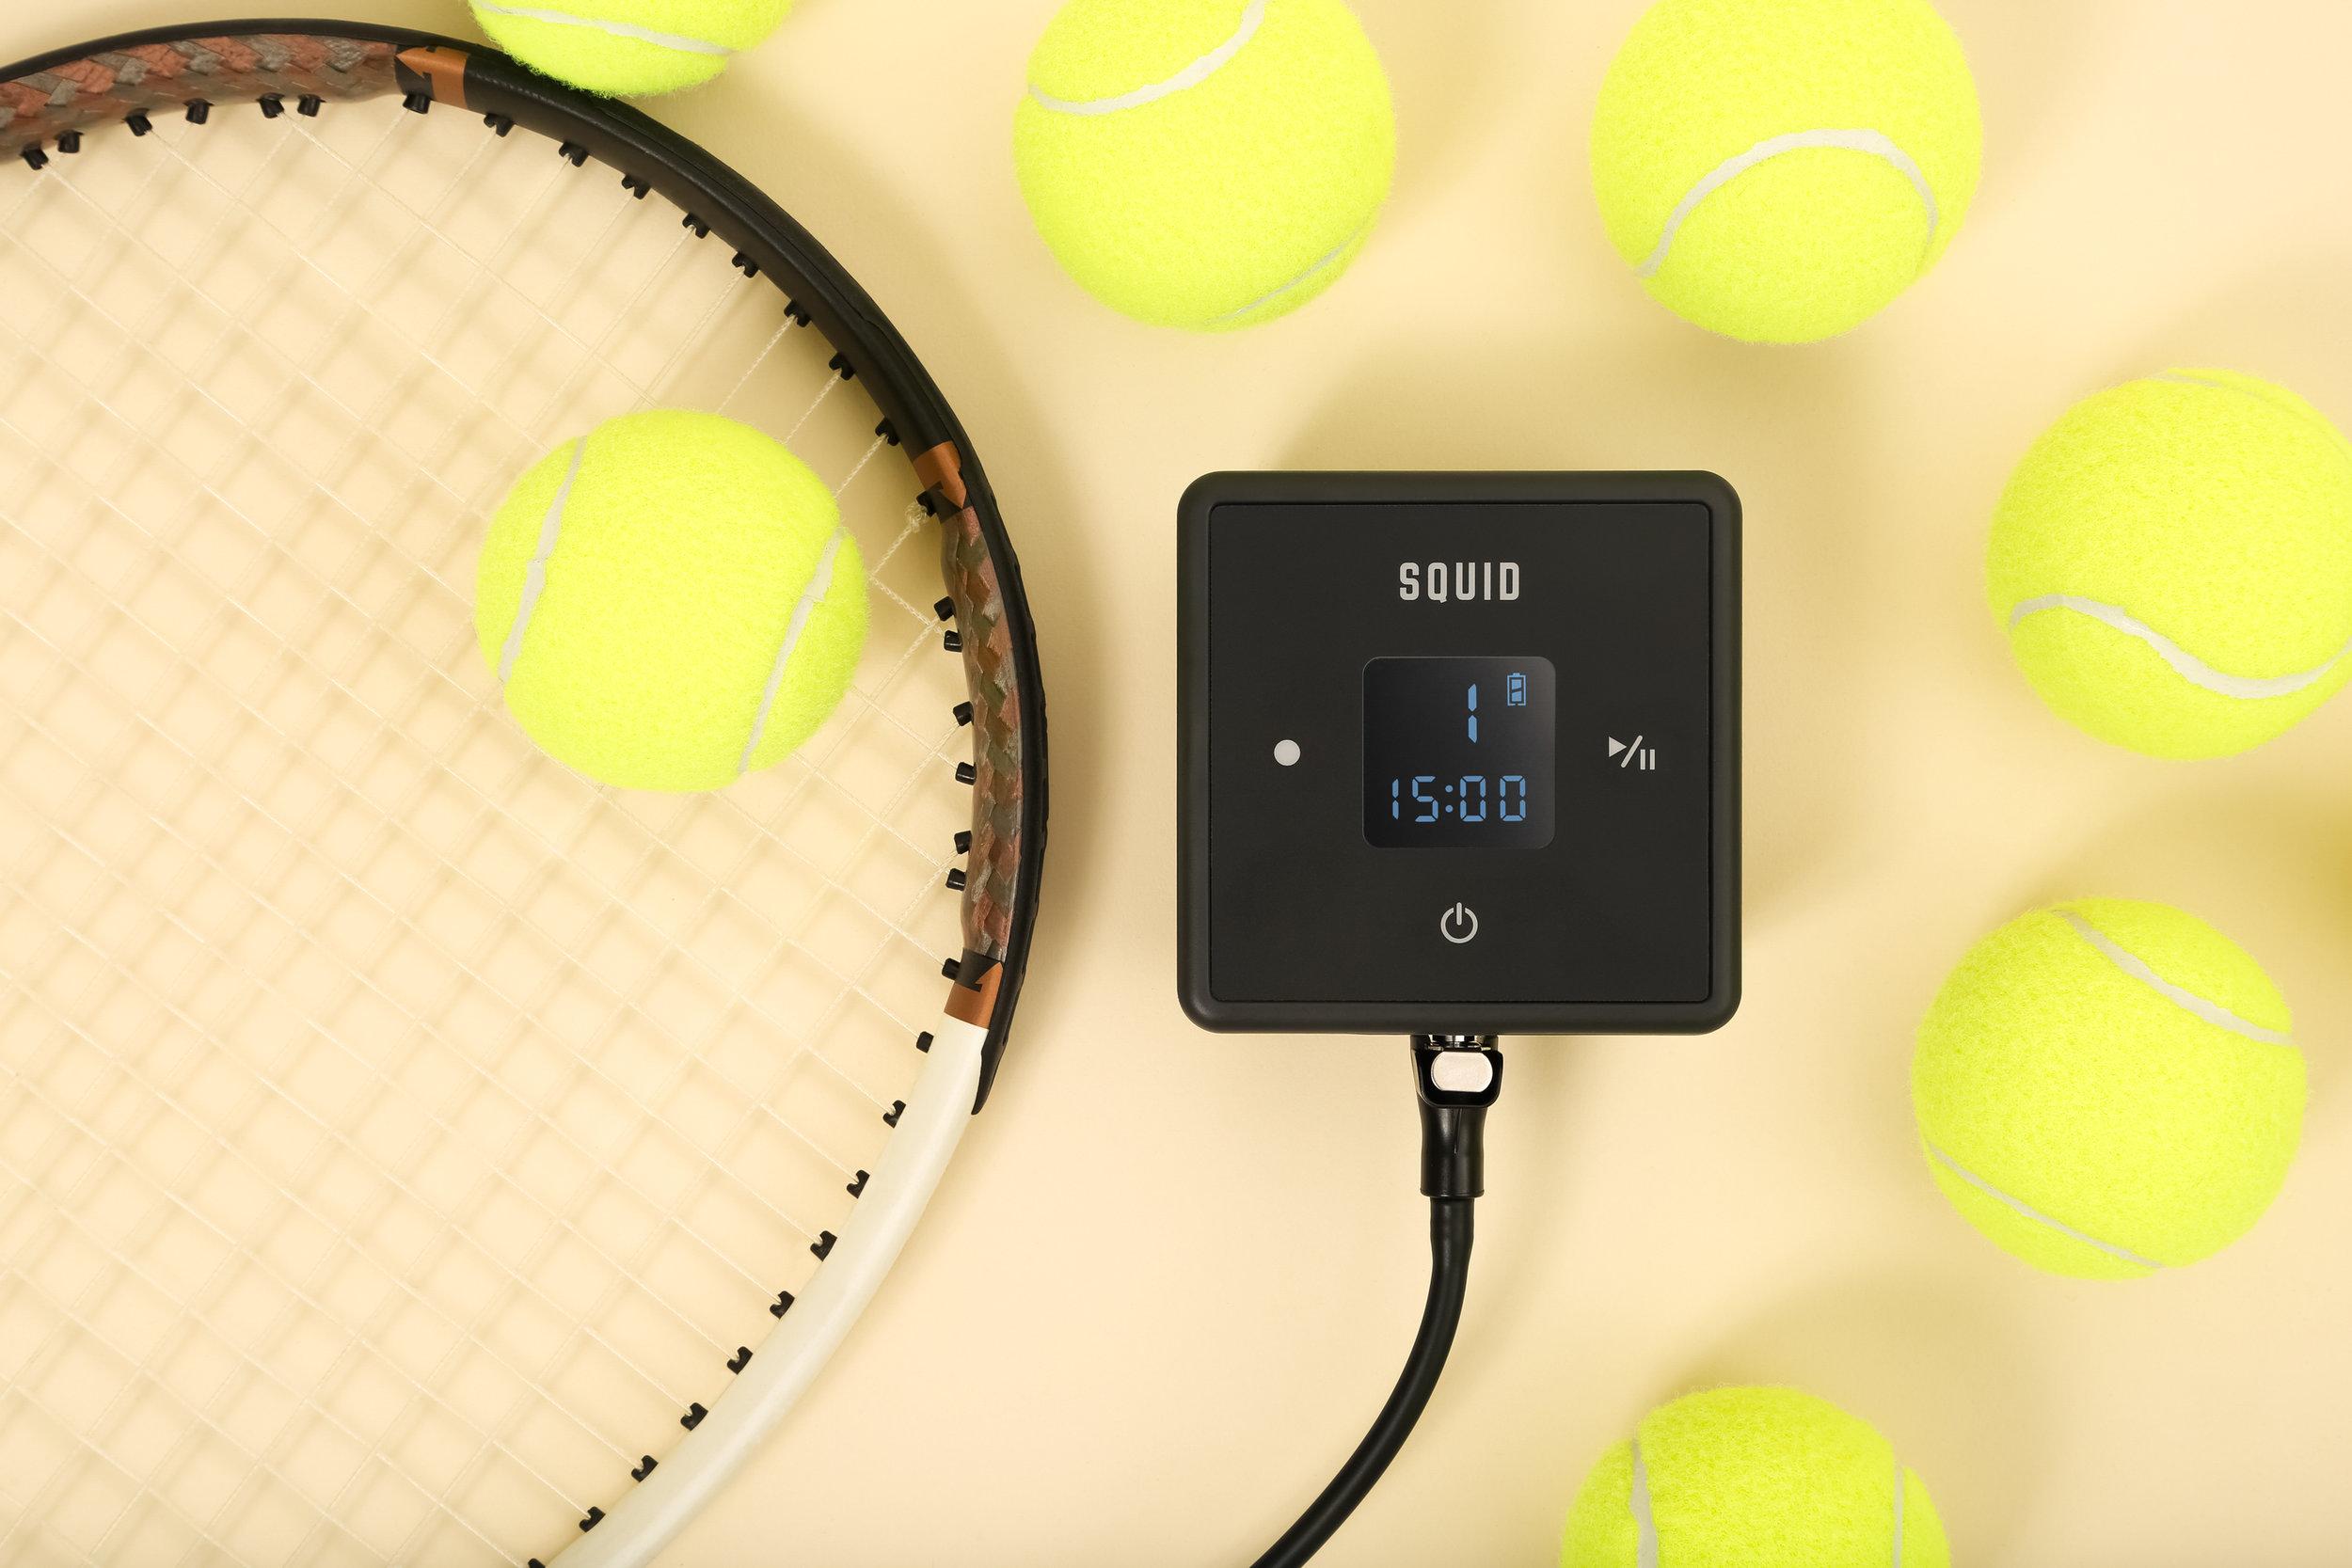 SquidGo_Tennis1-2.JPG